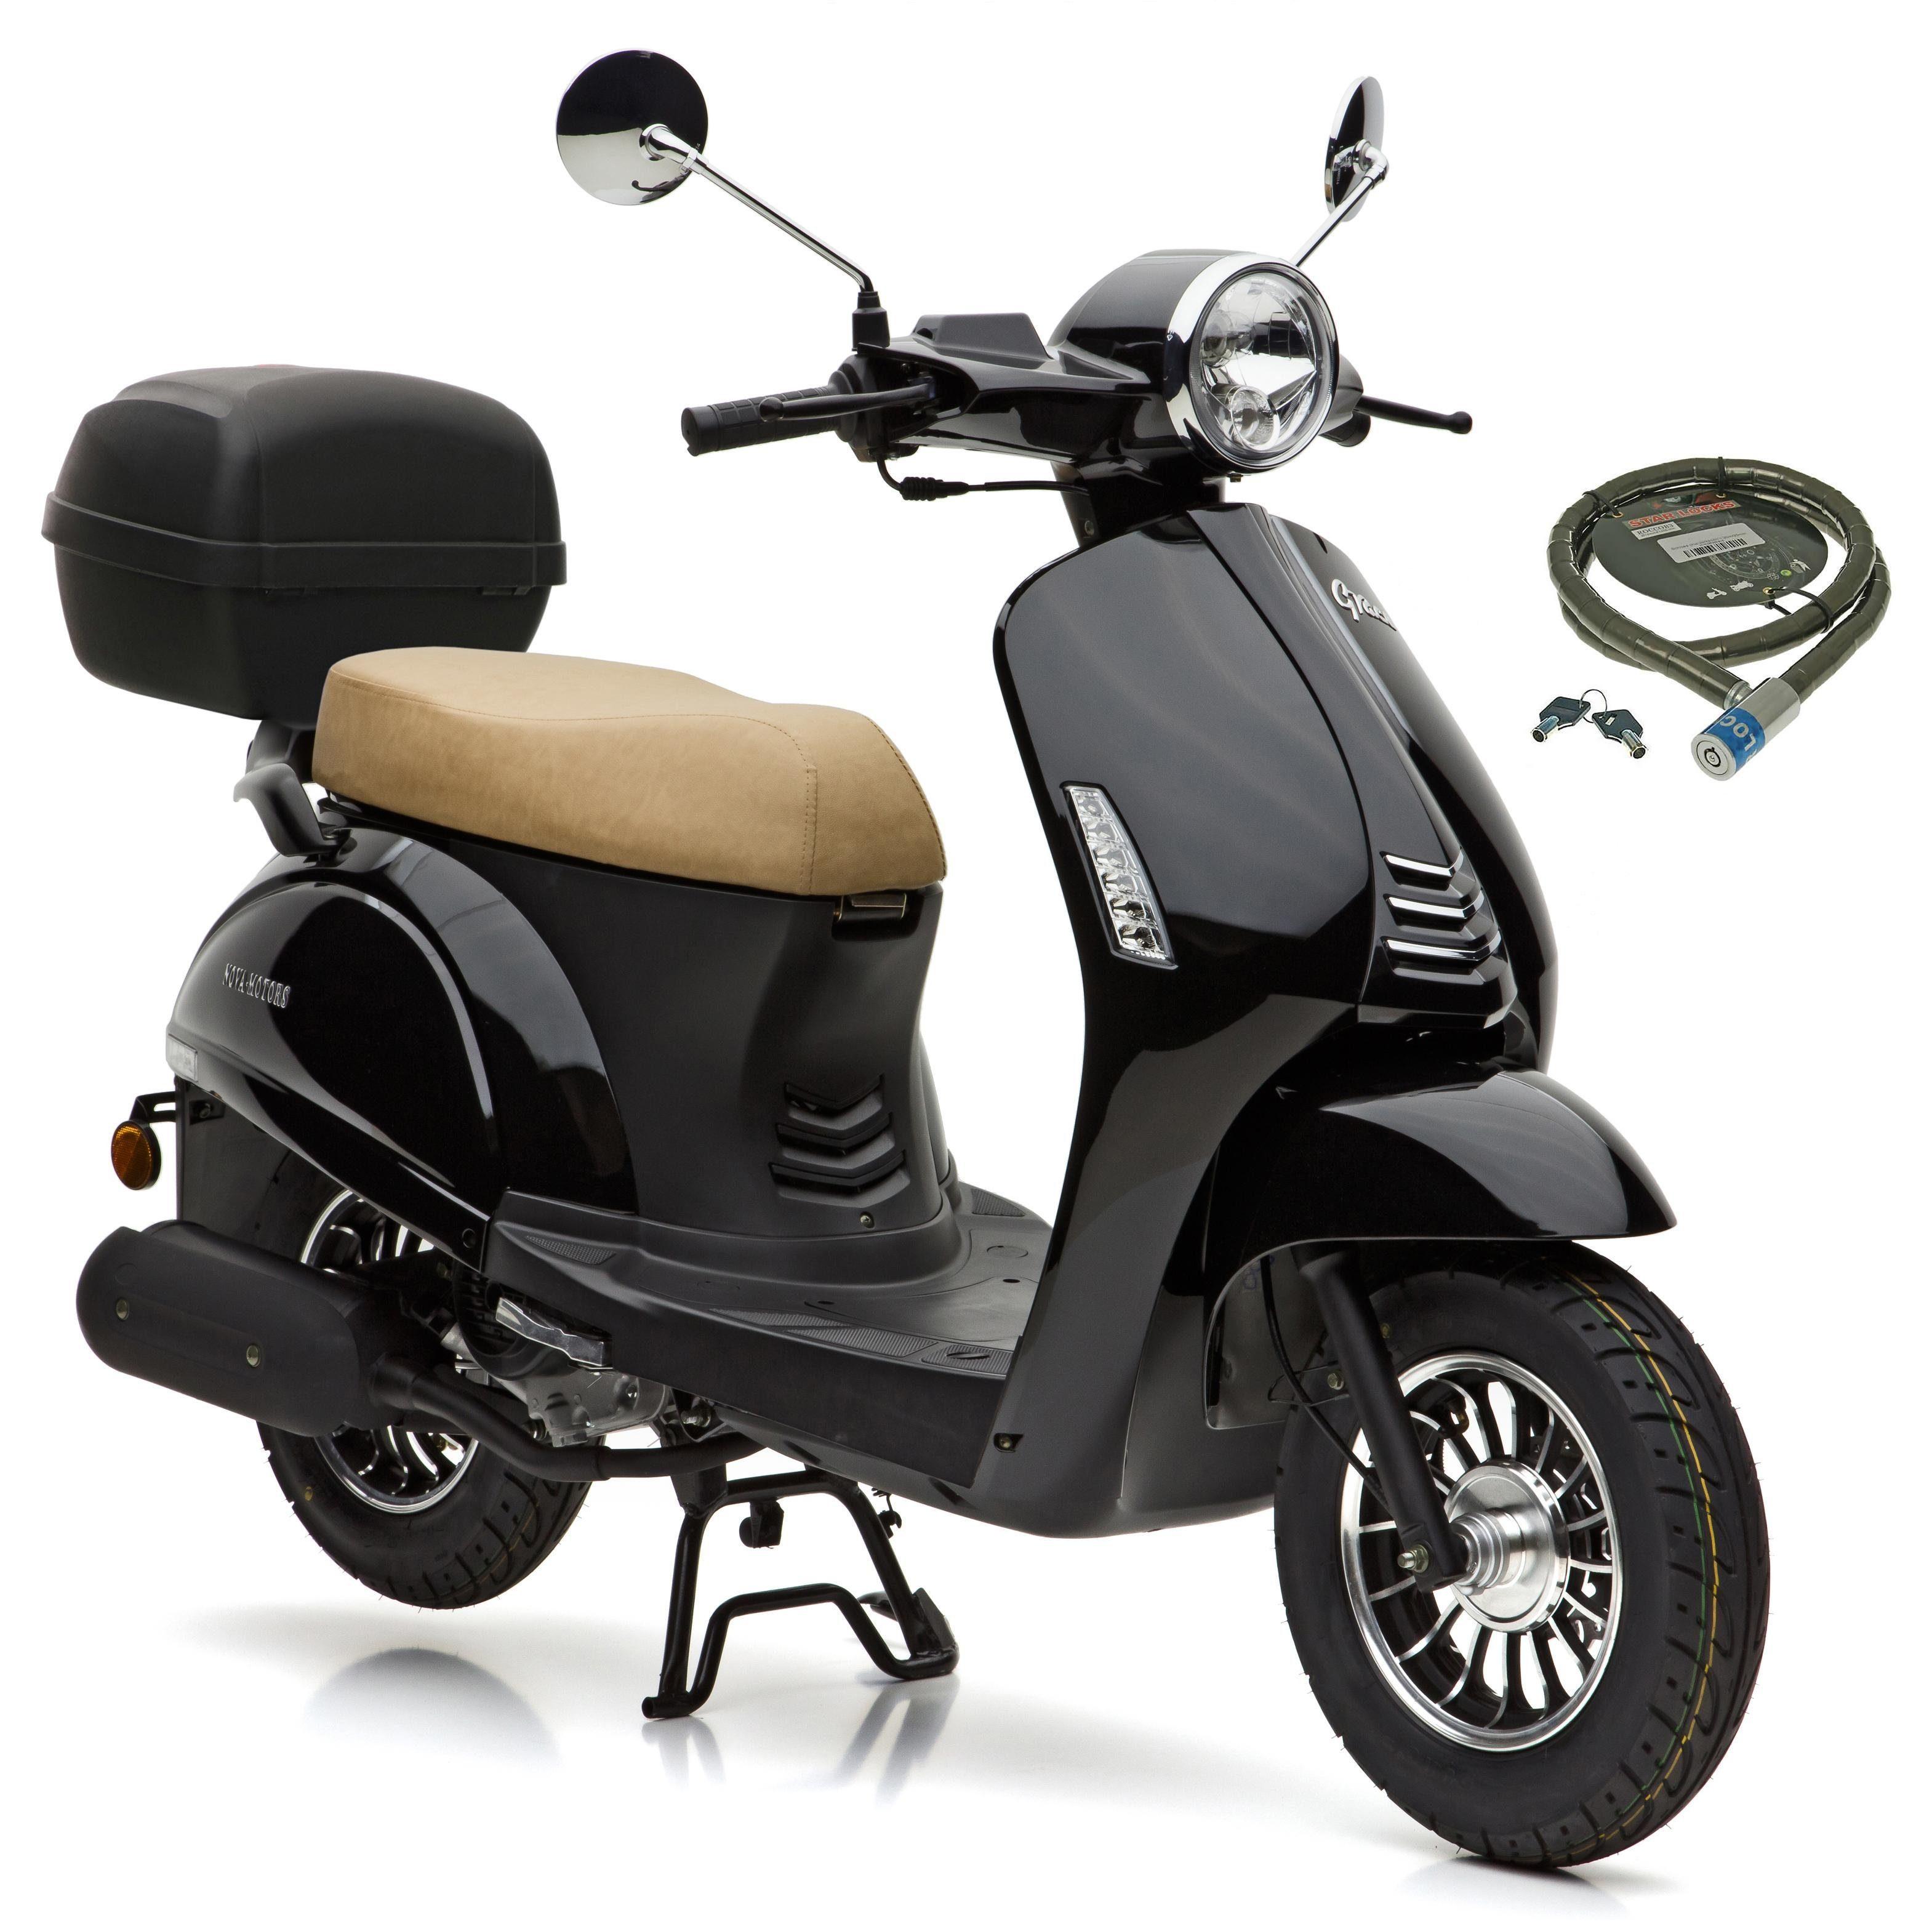 Nova Motors Motorroller »Grace«, 49 ccm, 45 km/h, Euro 4, (Set, mit Topcase), inkl. Topcase, 49 ccm, 45 km/h